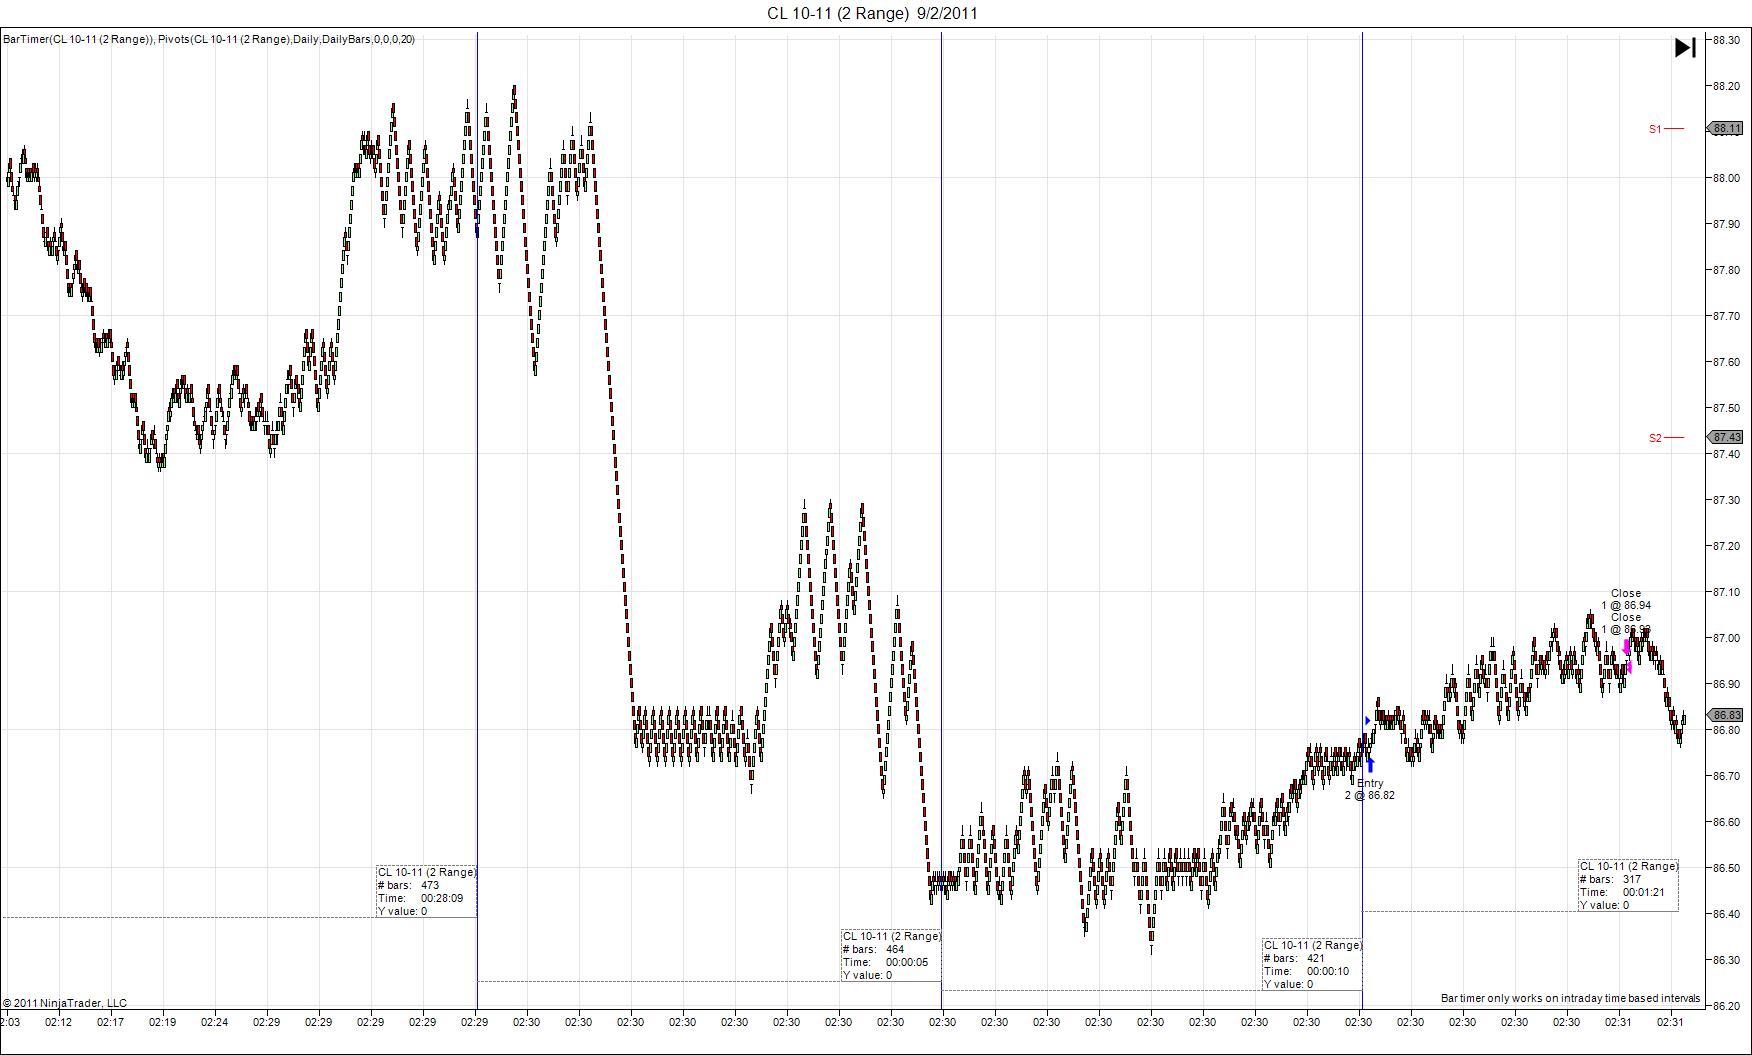 CL 10 11 (2 Range) 09.02.11